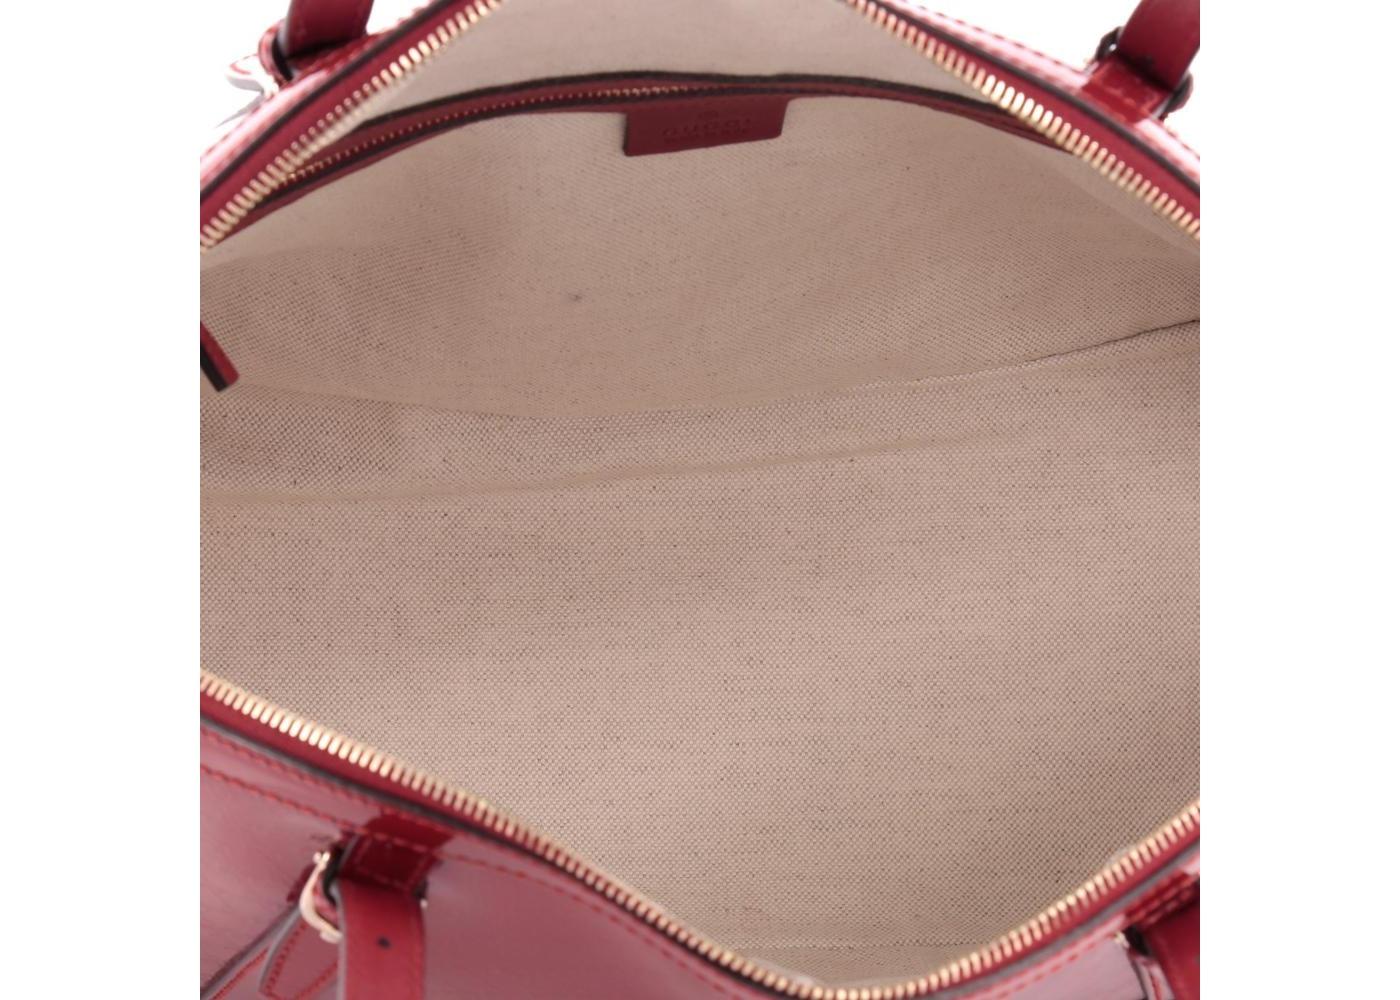 57bb6f600f19 Gucci Nice Top Handle Microguccissima Top Handle Medium Glossy Red